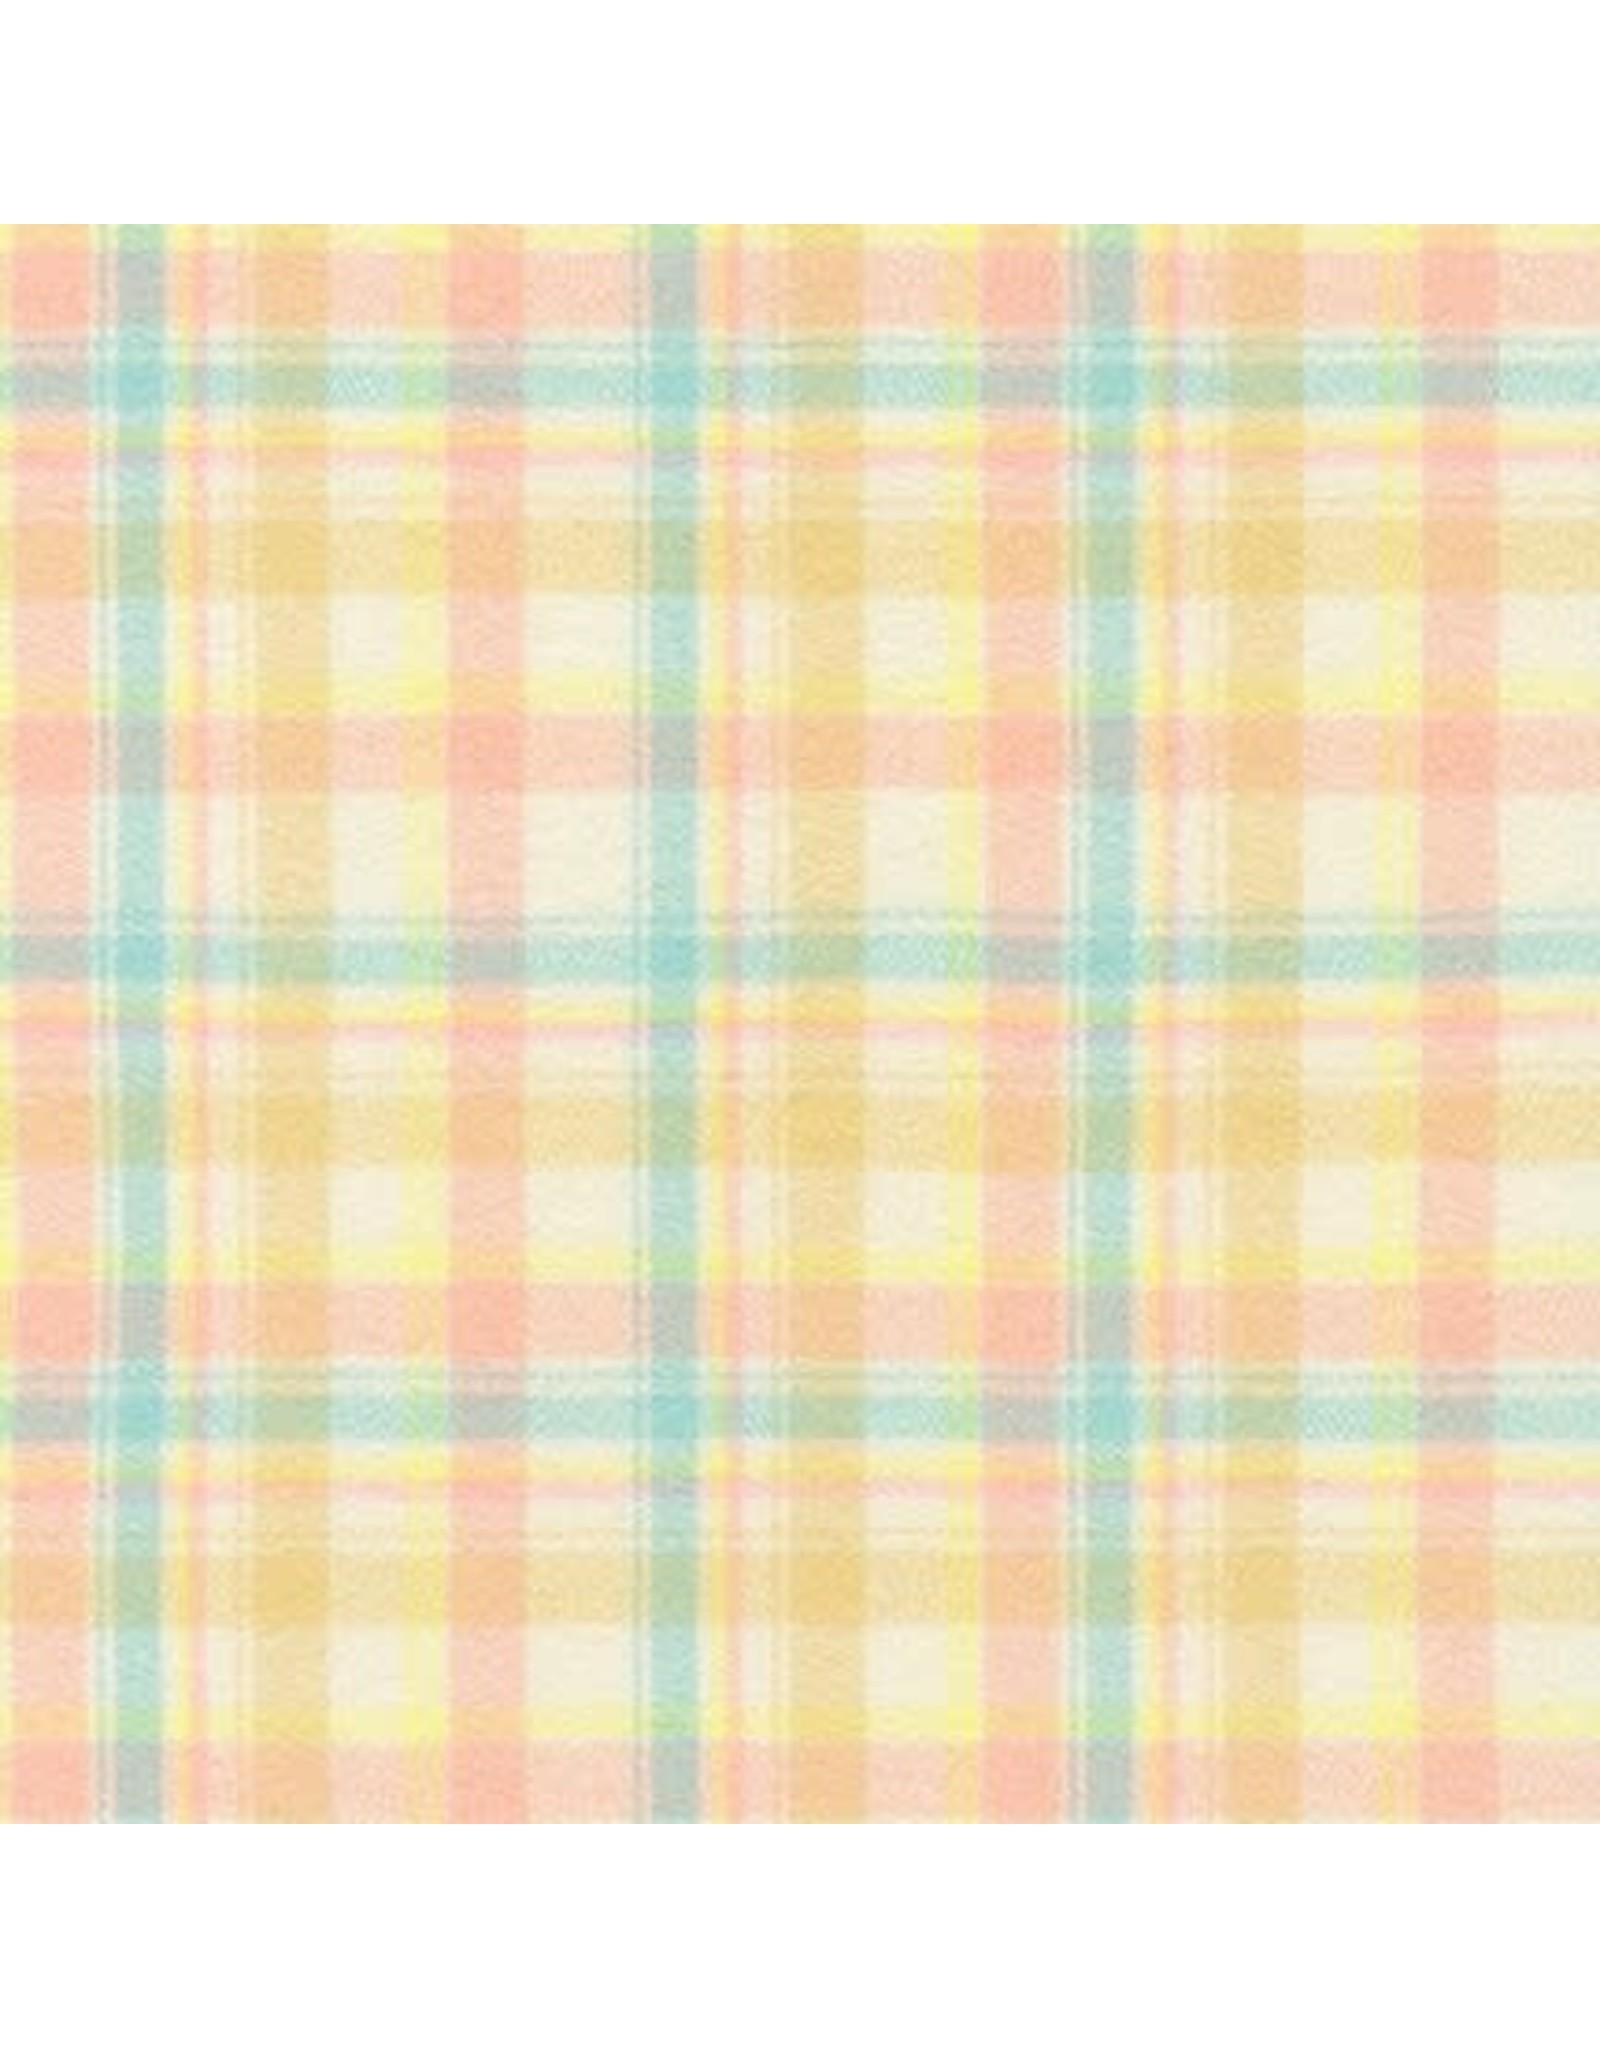 Robert Kaufman Yarn Dyed Cotton Flannel, Mammoth Junior Flannel in Pastel, Fabric Half-Yards